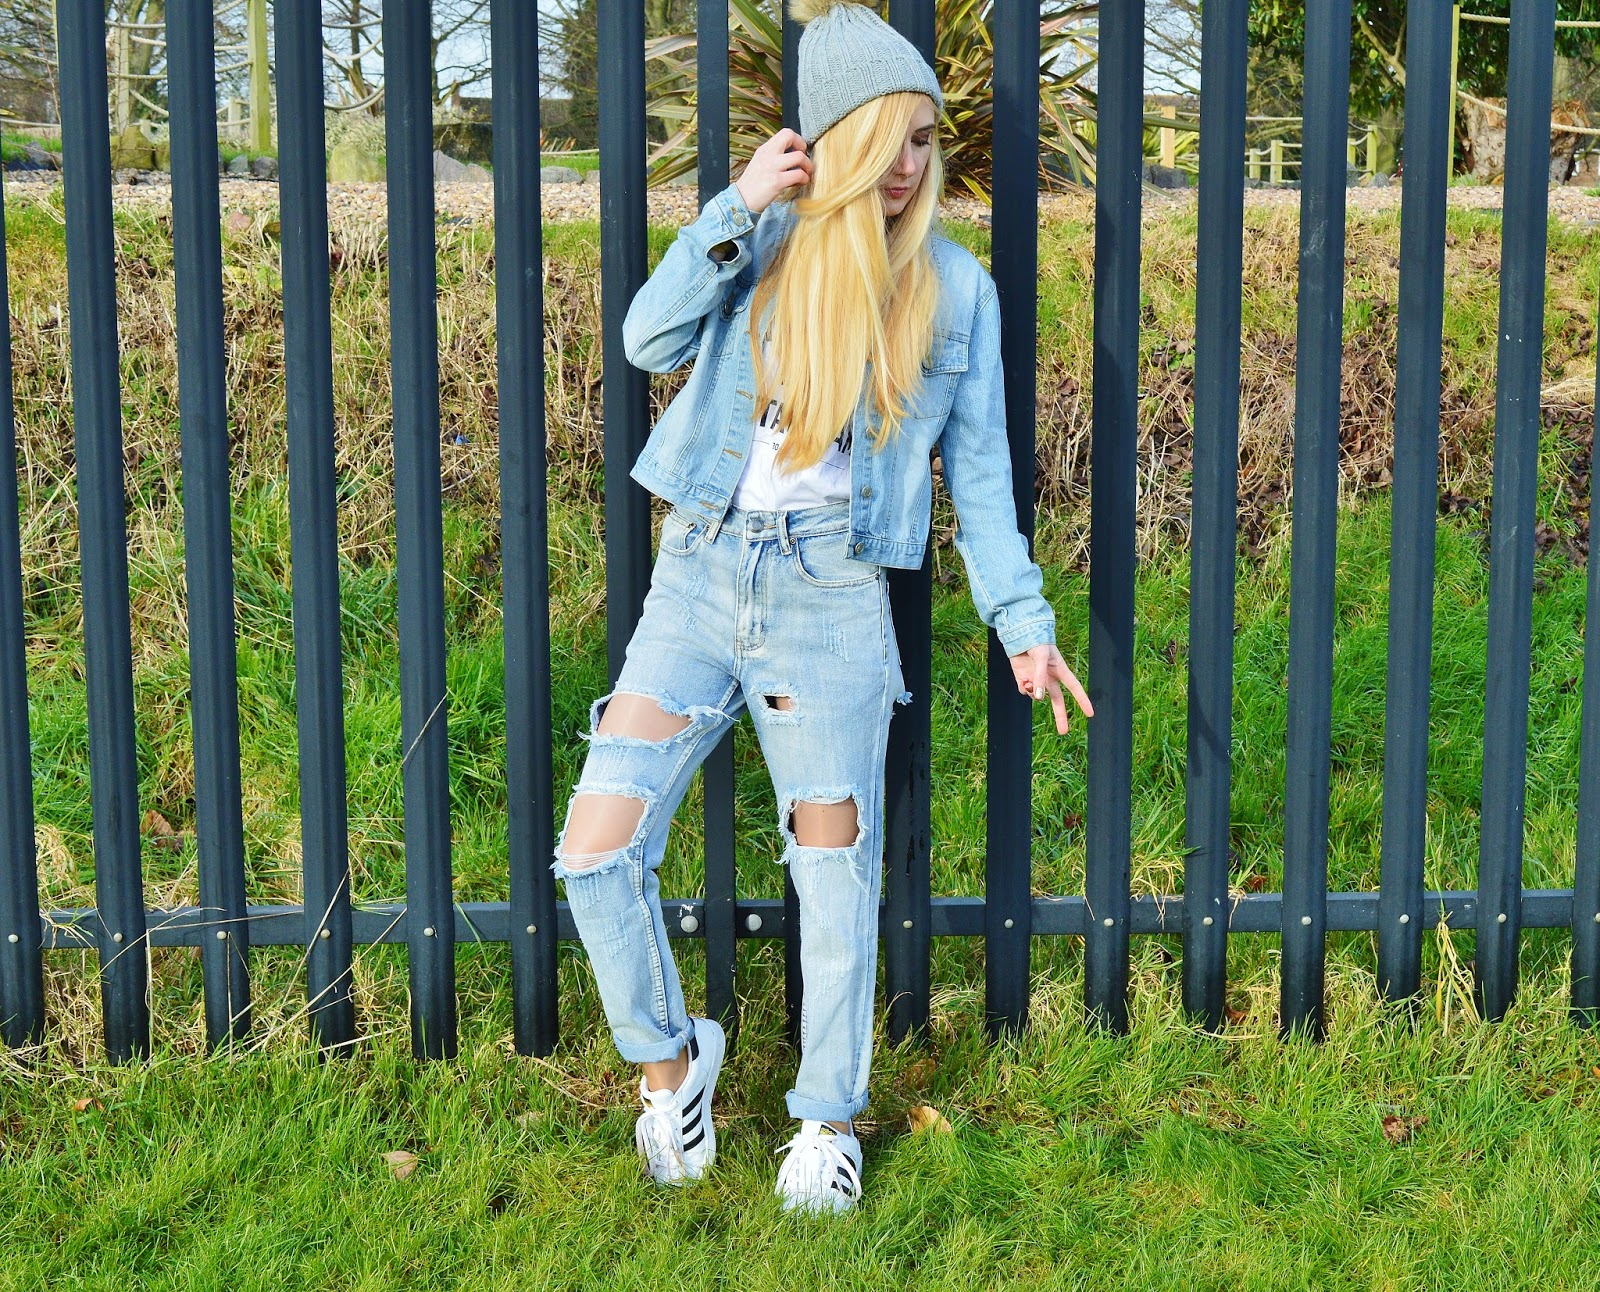 Fashionista Chic